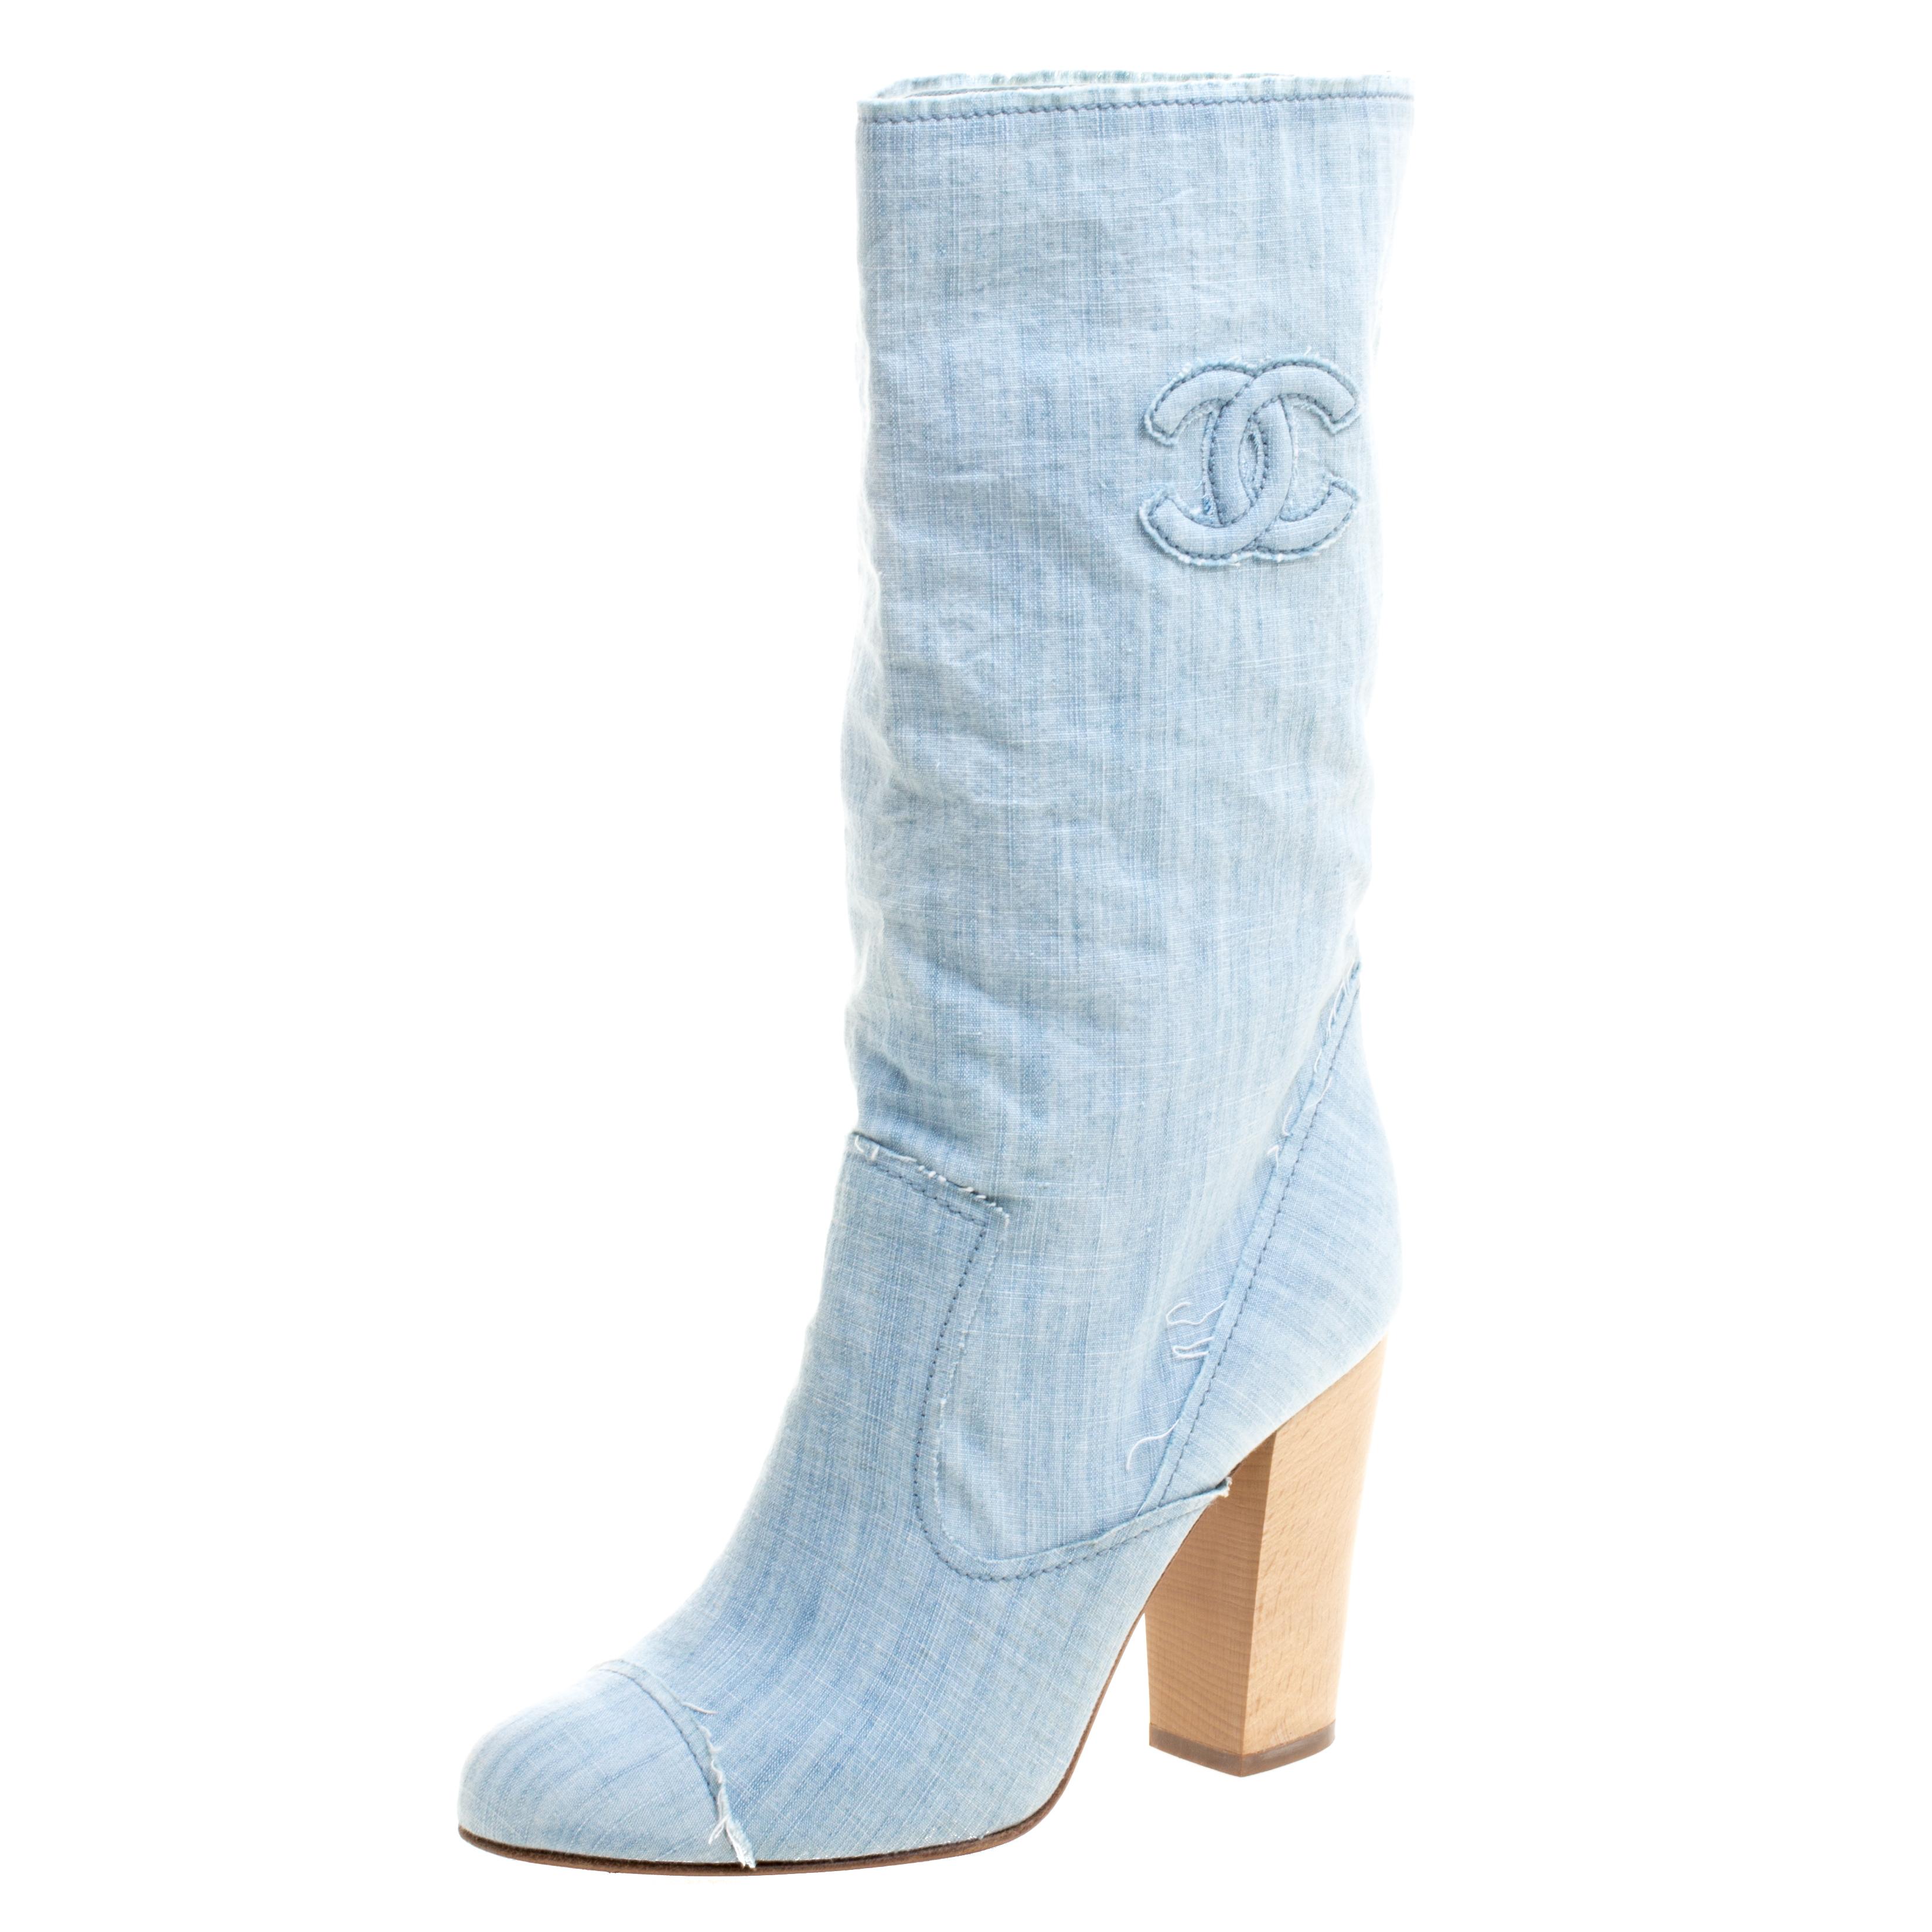 Chanel Light Blue Denim Wash Mid Calf